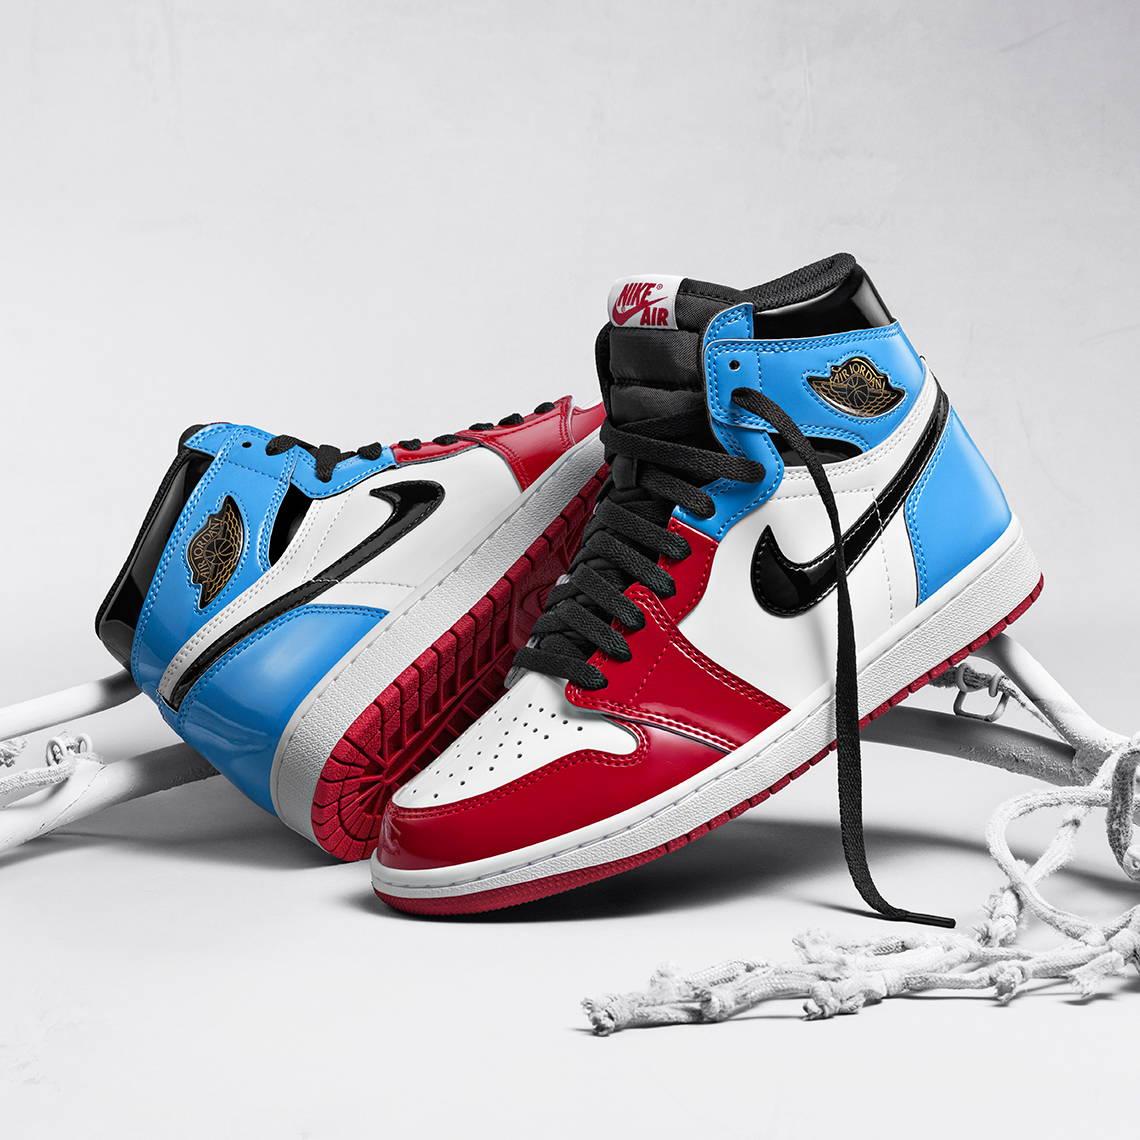 air-jordan-1-fearless-ck5666-100-sneakers-heat-1